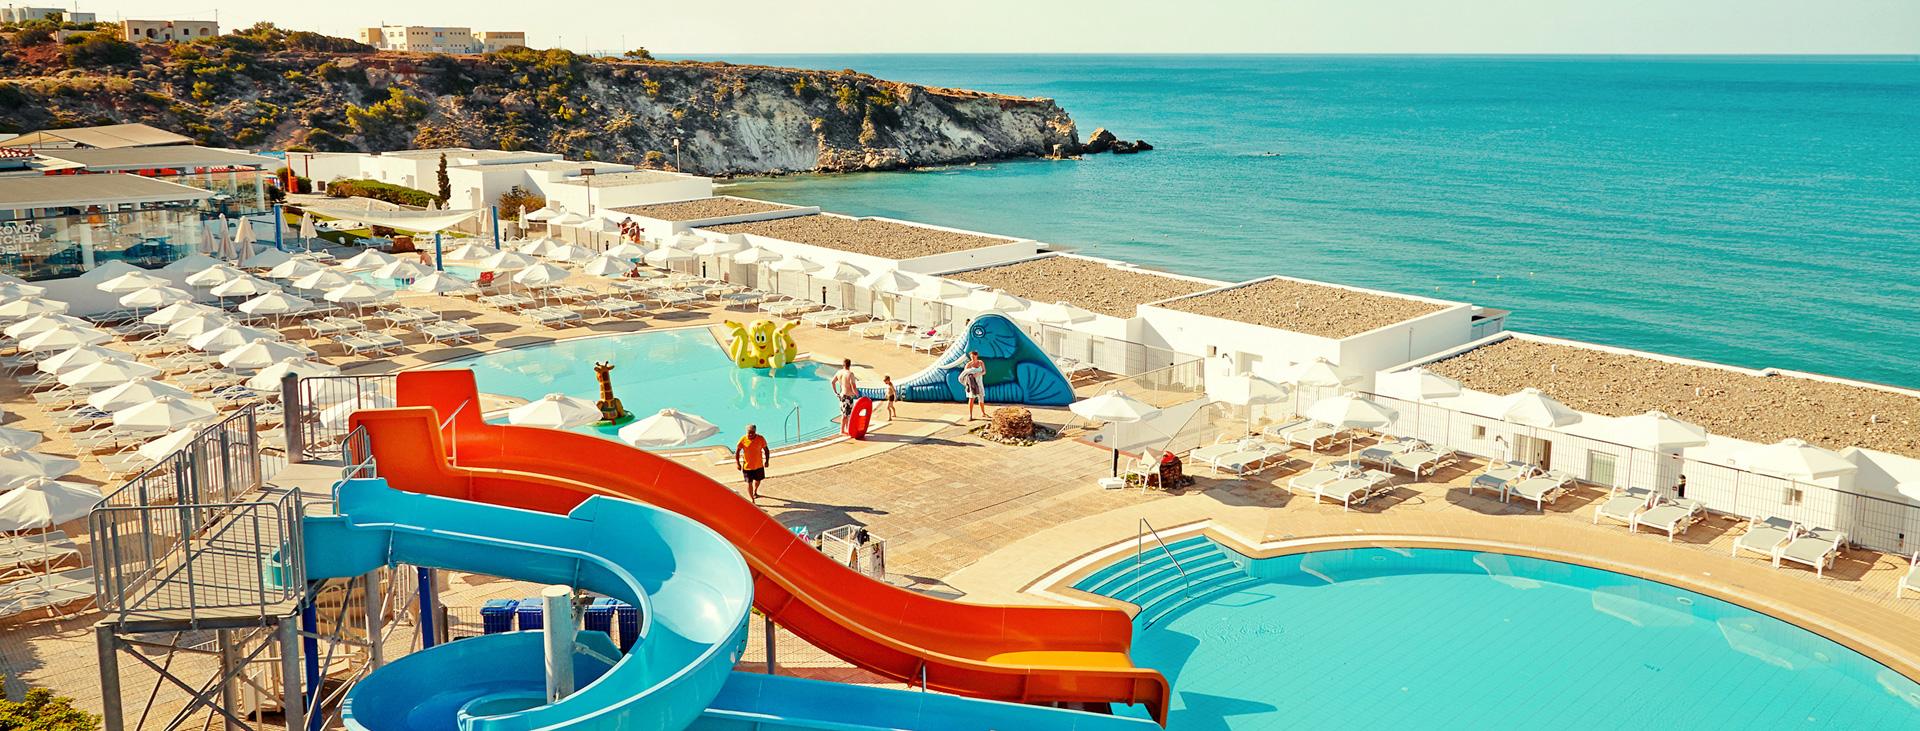 Sunwing Makrigialos Beach, Makrigialos, Kreta, Grekland